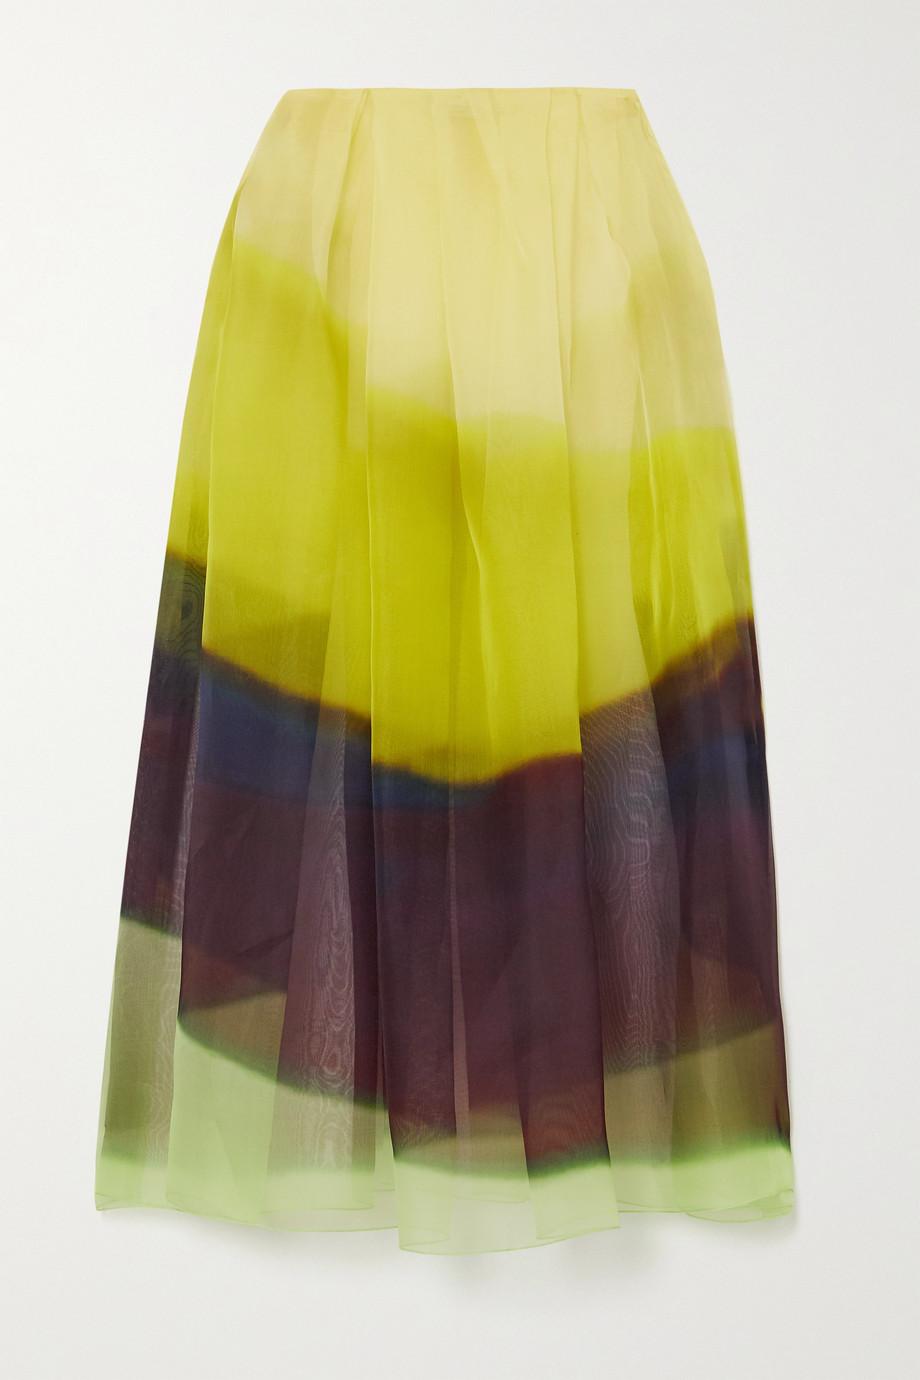 Dries Van Noten Pleated striped silk-organza skirt